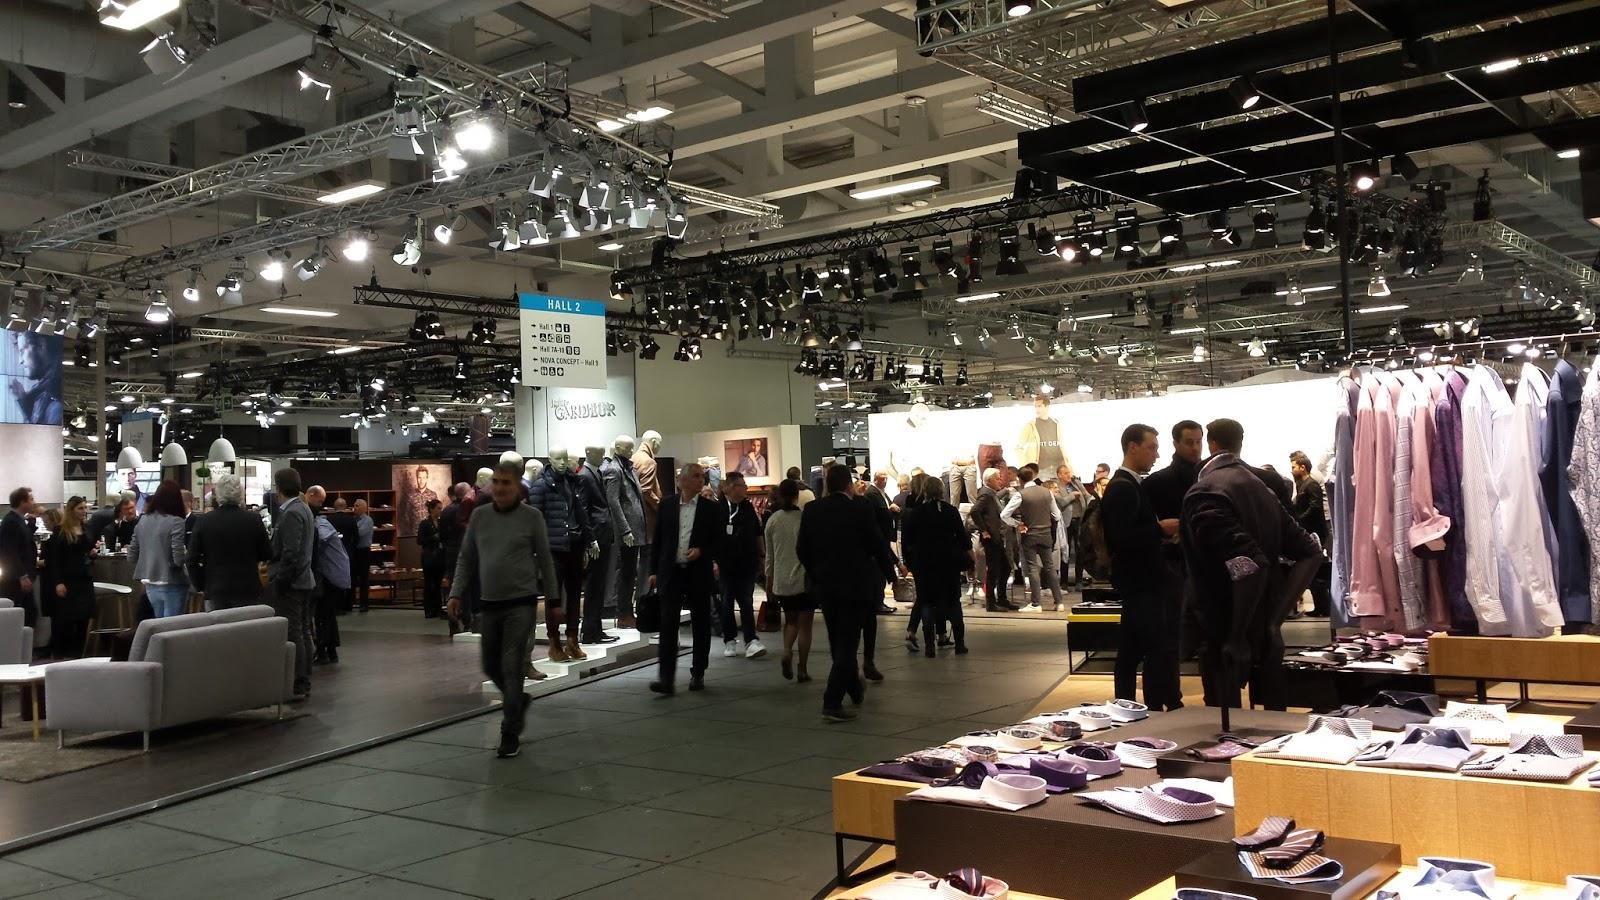 showroom Panorama Berlin 2017, relacja blogerki z Berlin Fashion Week styczeń 2017